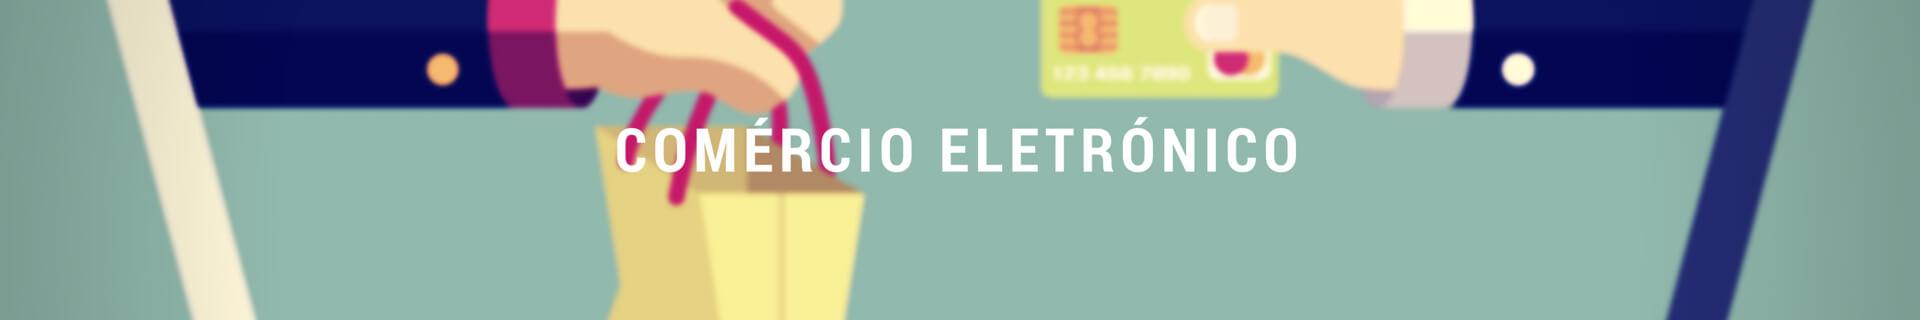 slider-comercio-eletronico